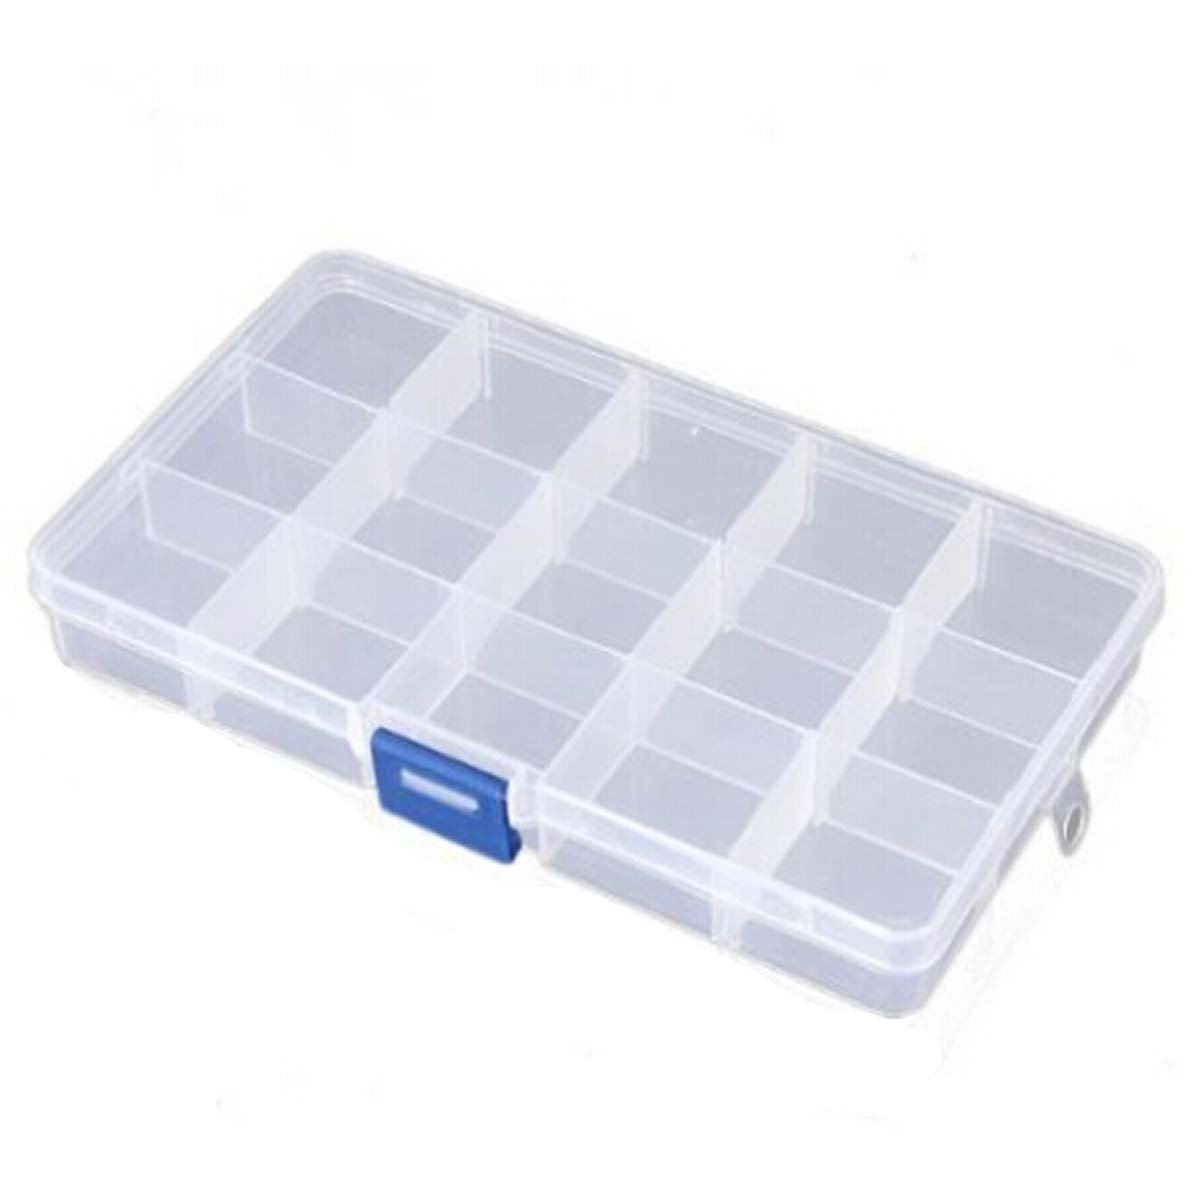 15 Grid Clear Adjustable Jewelry Bead Organizer Box Storage Container Case  sc 1 st  Amazon UK & Bead Storage: Amazon.co.uk